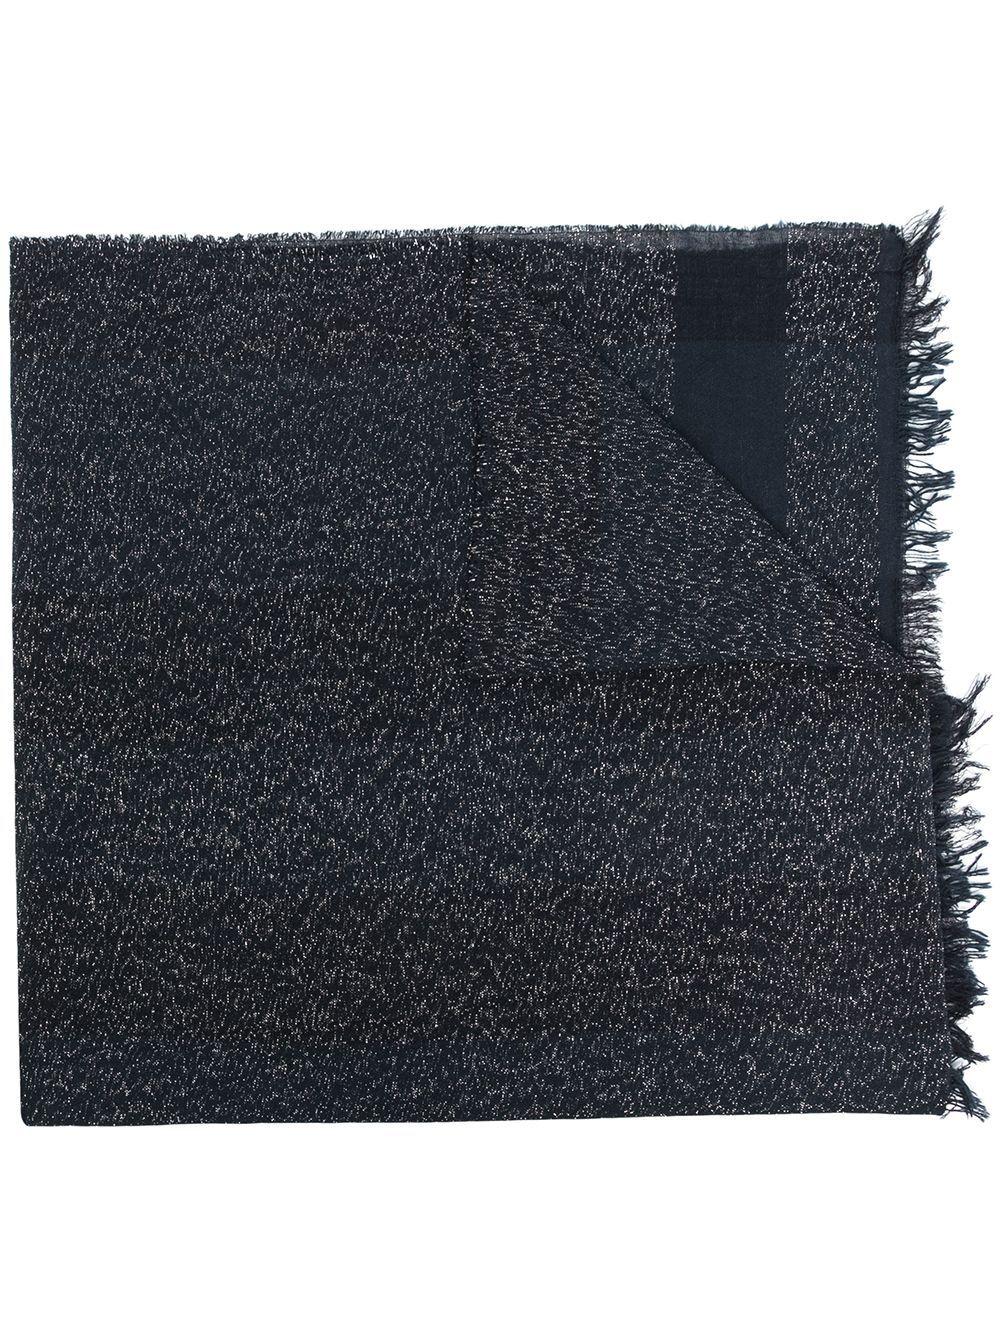 Stola in misto cotone